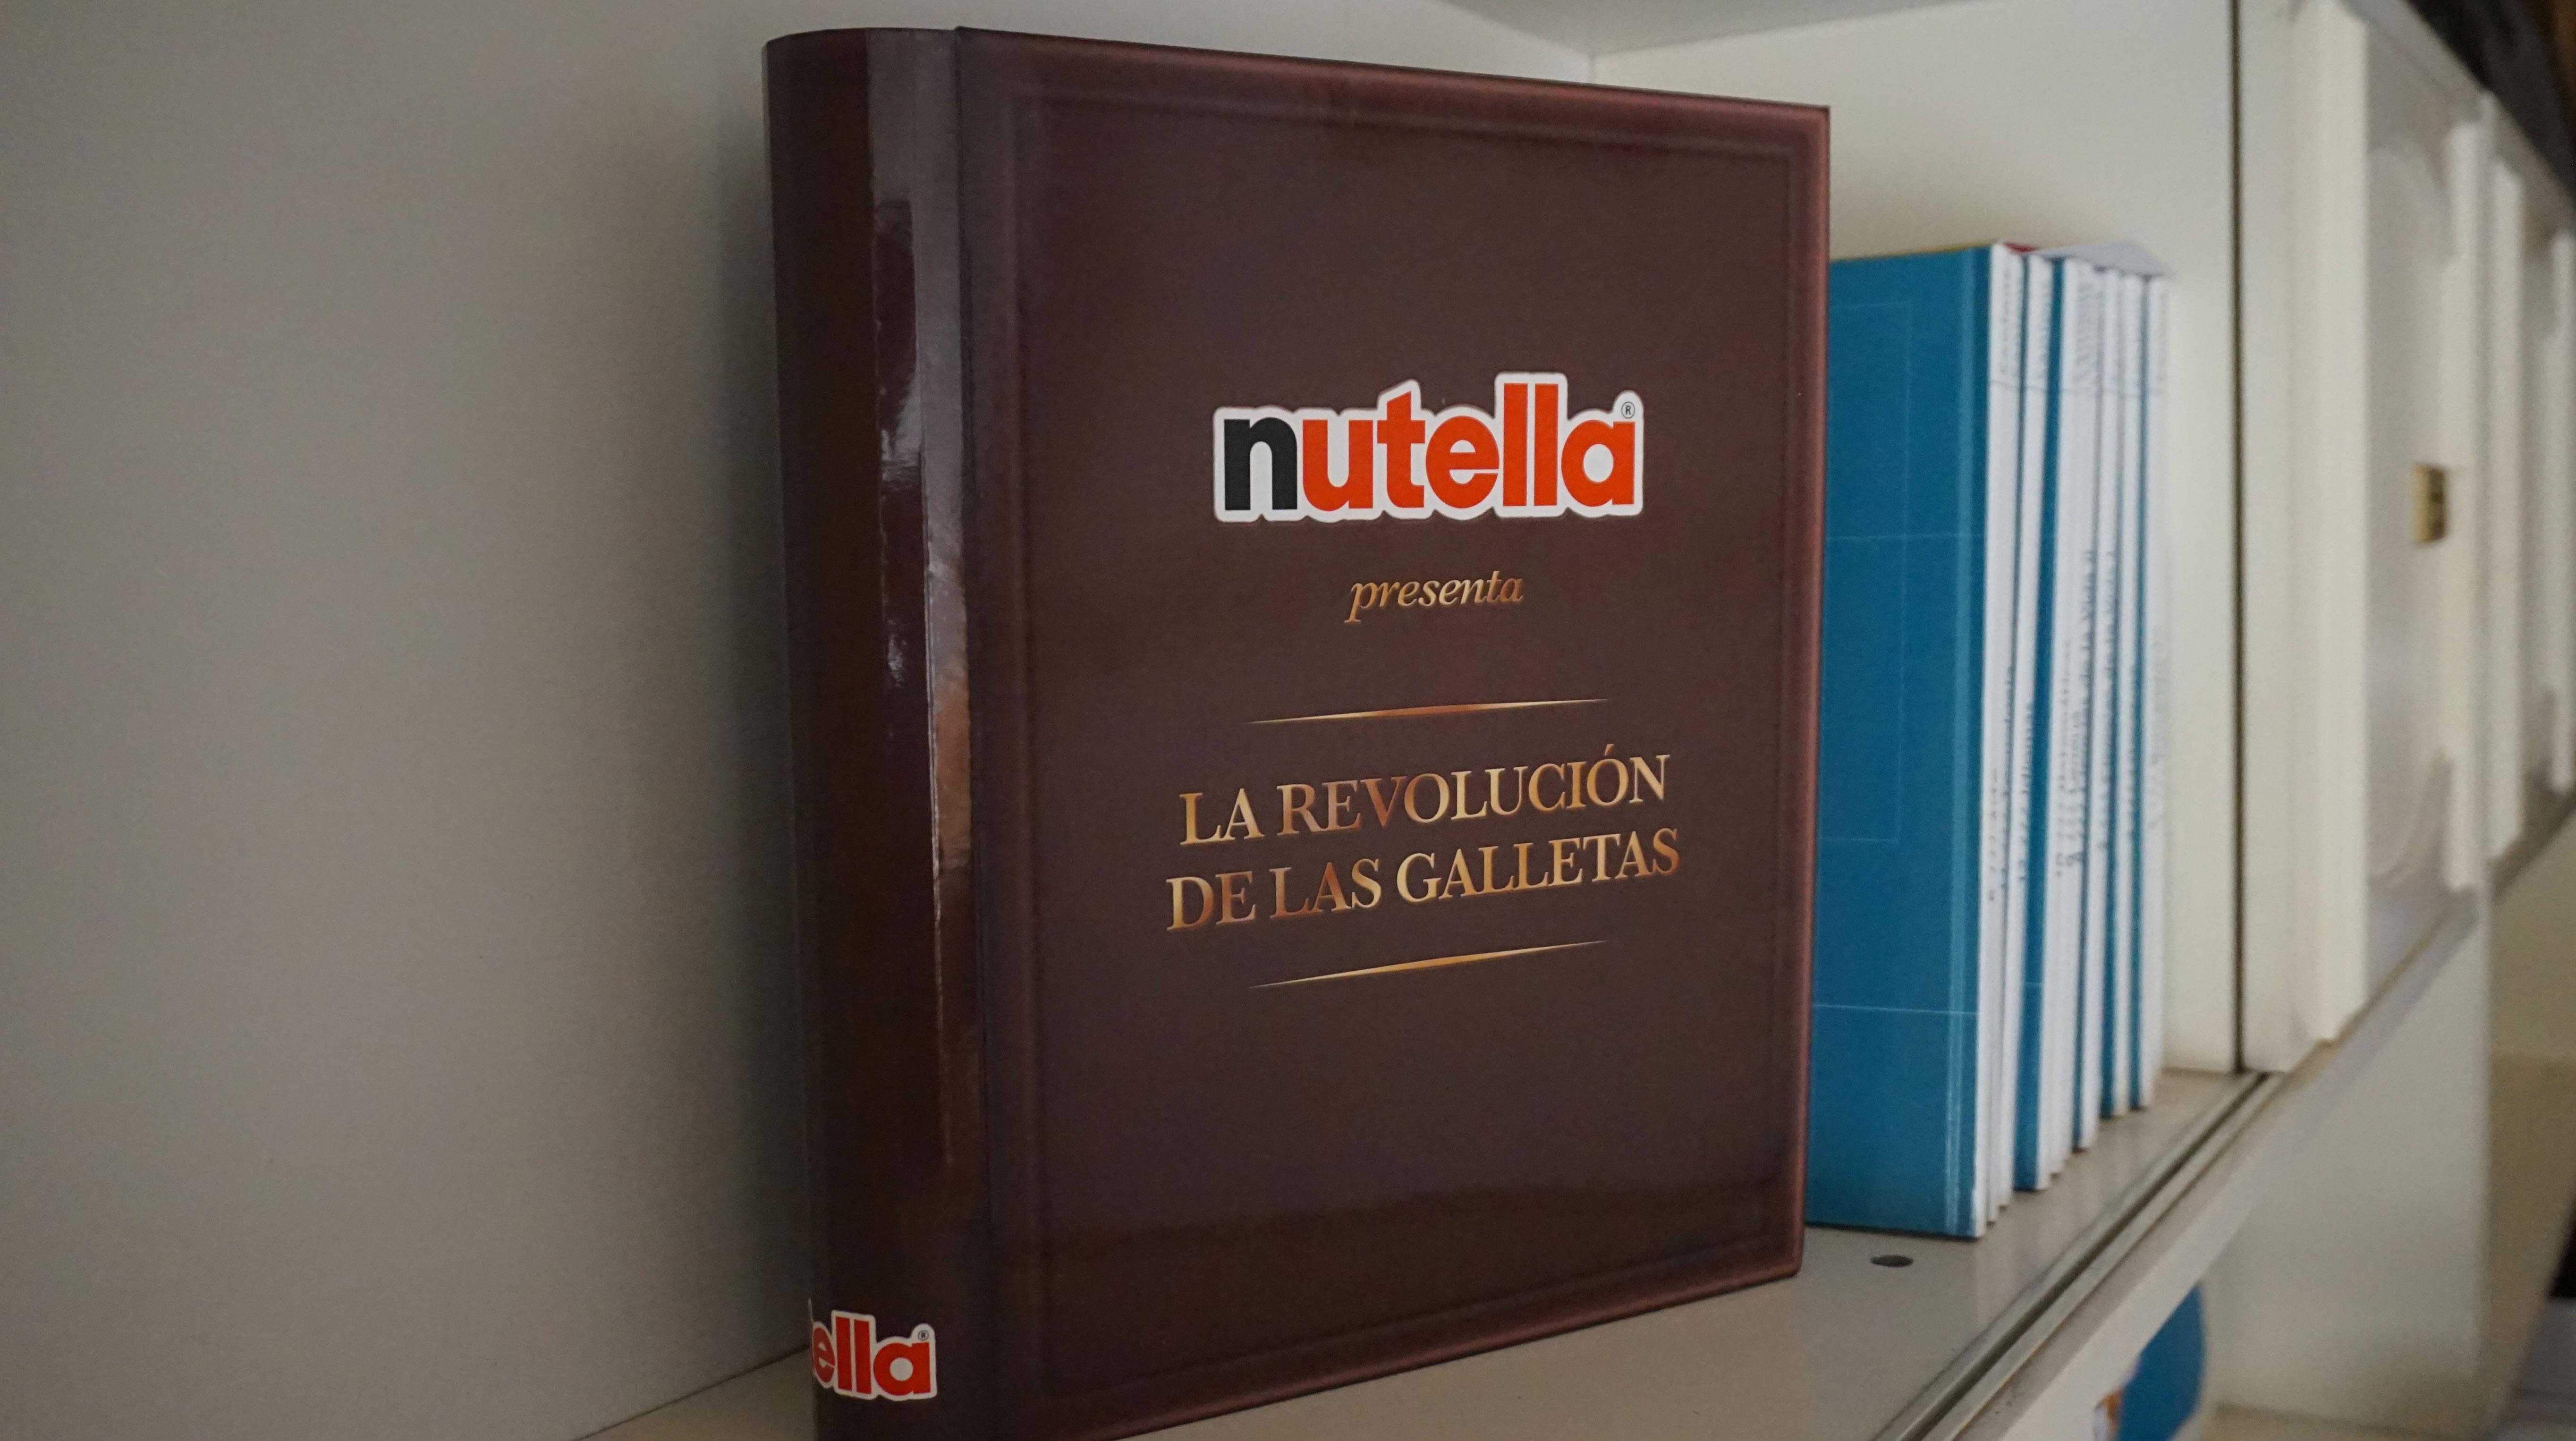 nutella-snack galleta